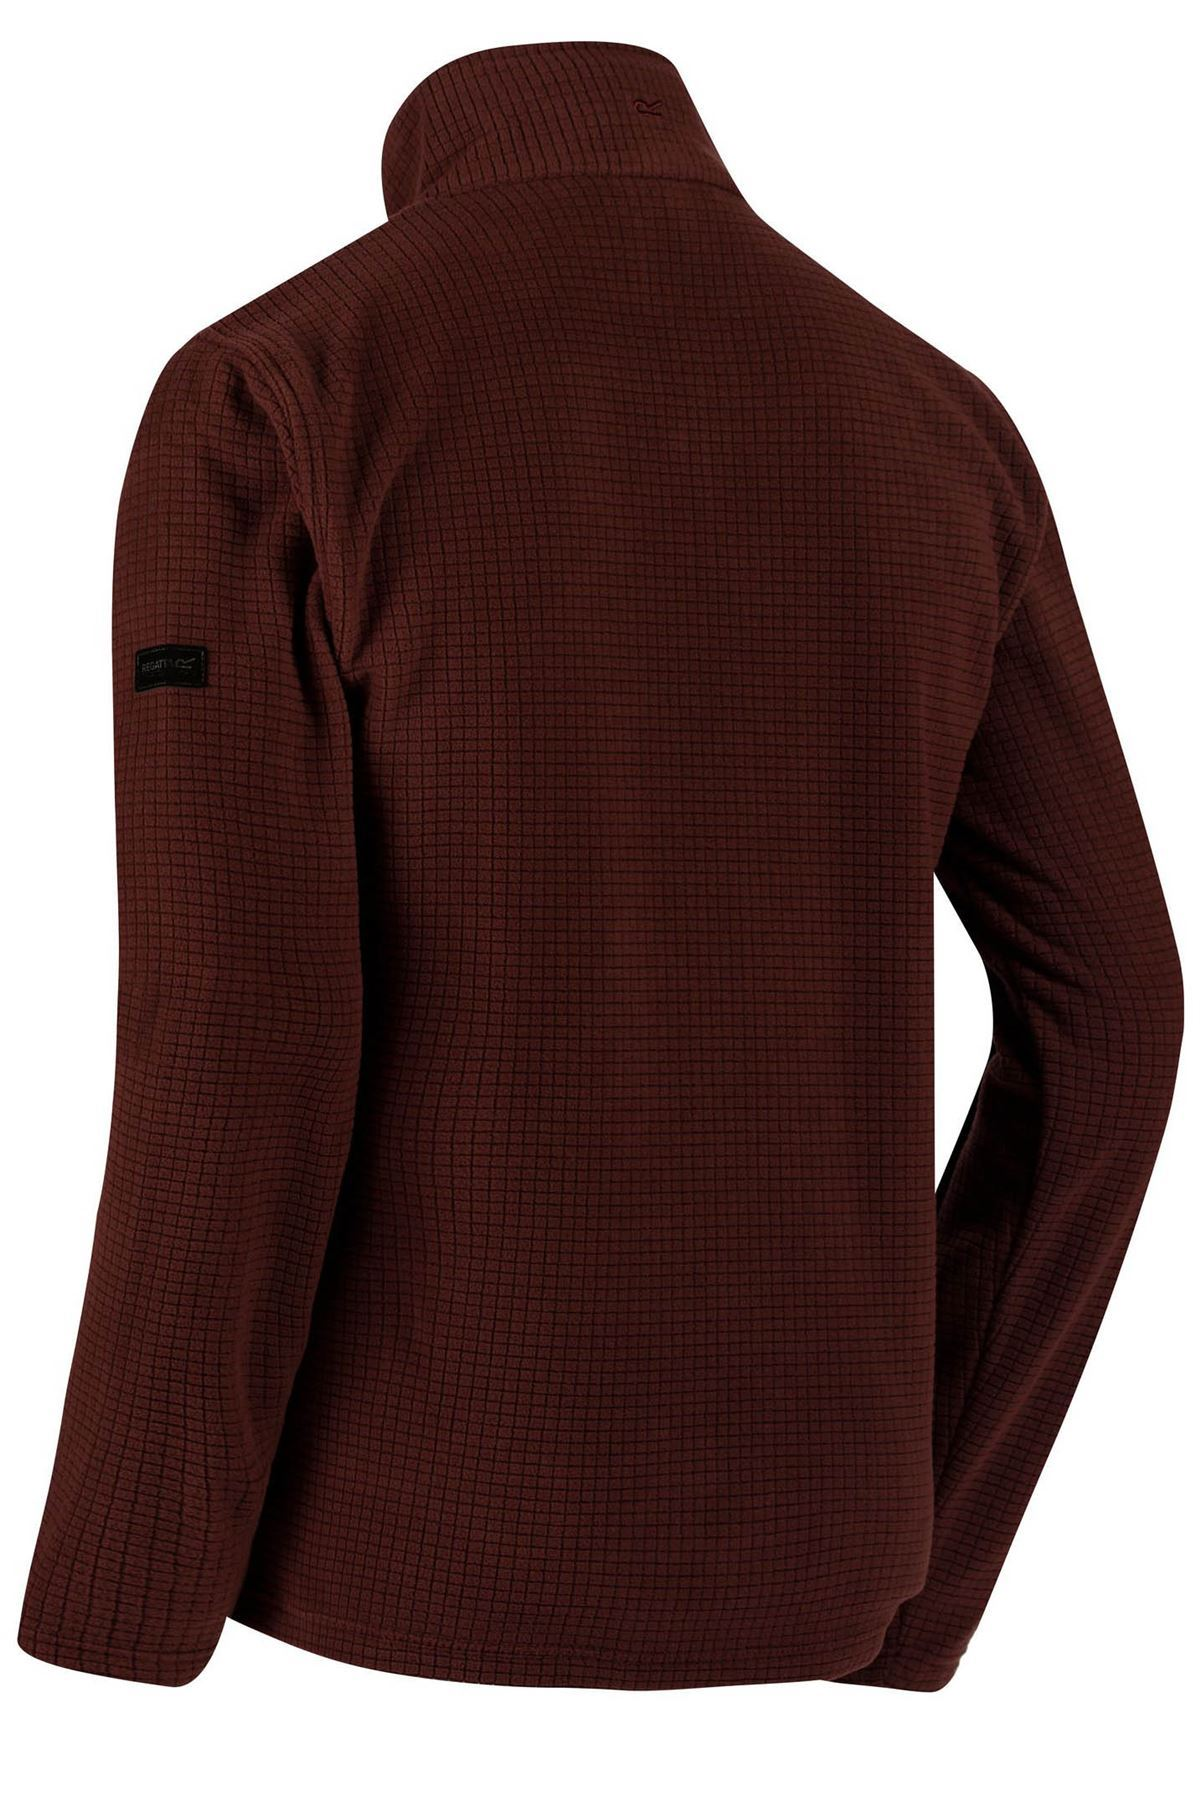 Regatta-Elgon-II-Hombre-rejilla-textura-Fleece-Half-Zip-Verde-Azul-Negro-Borgona